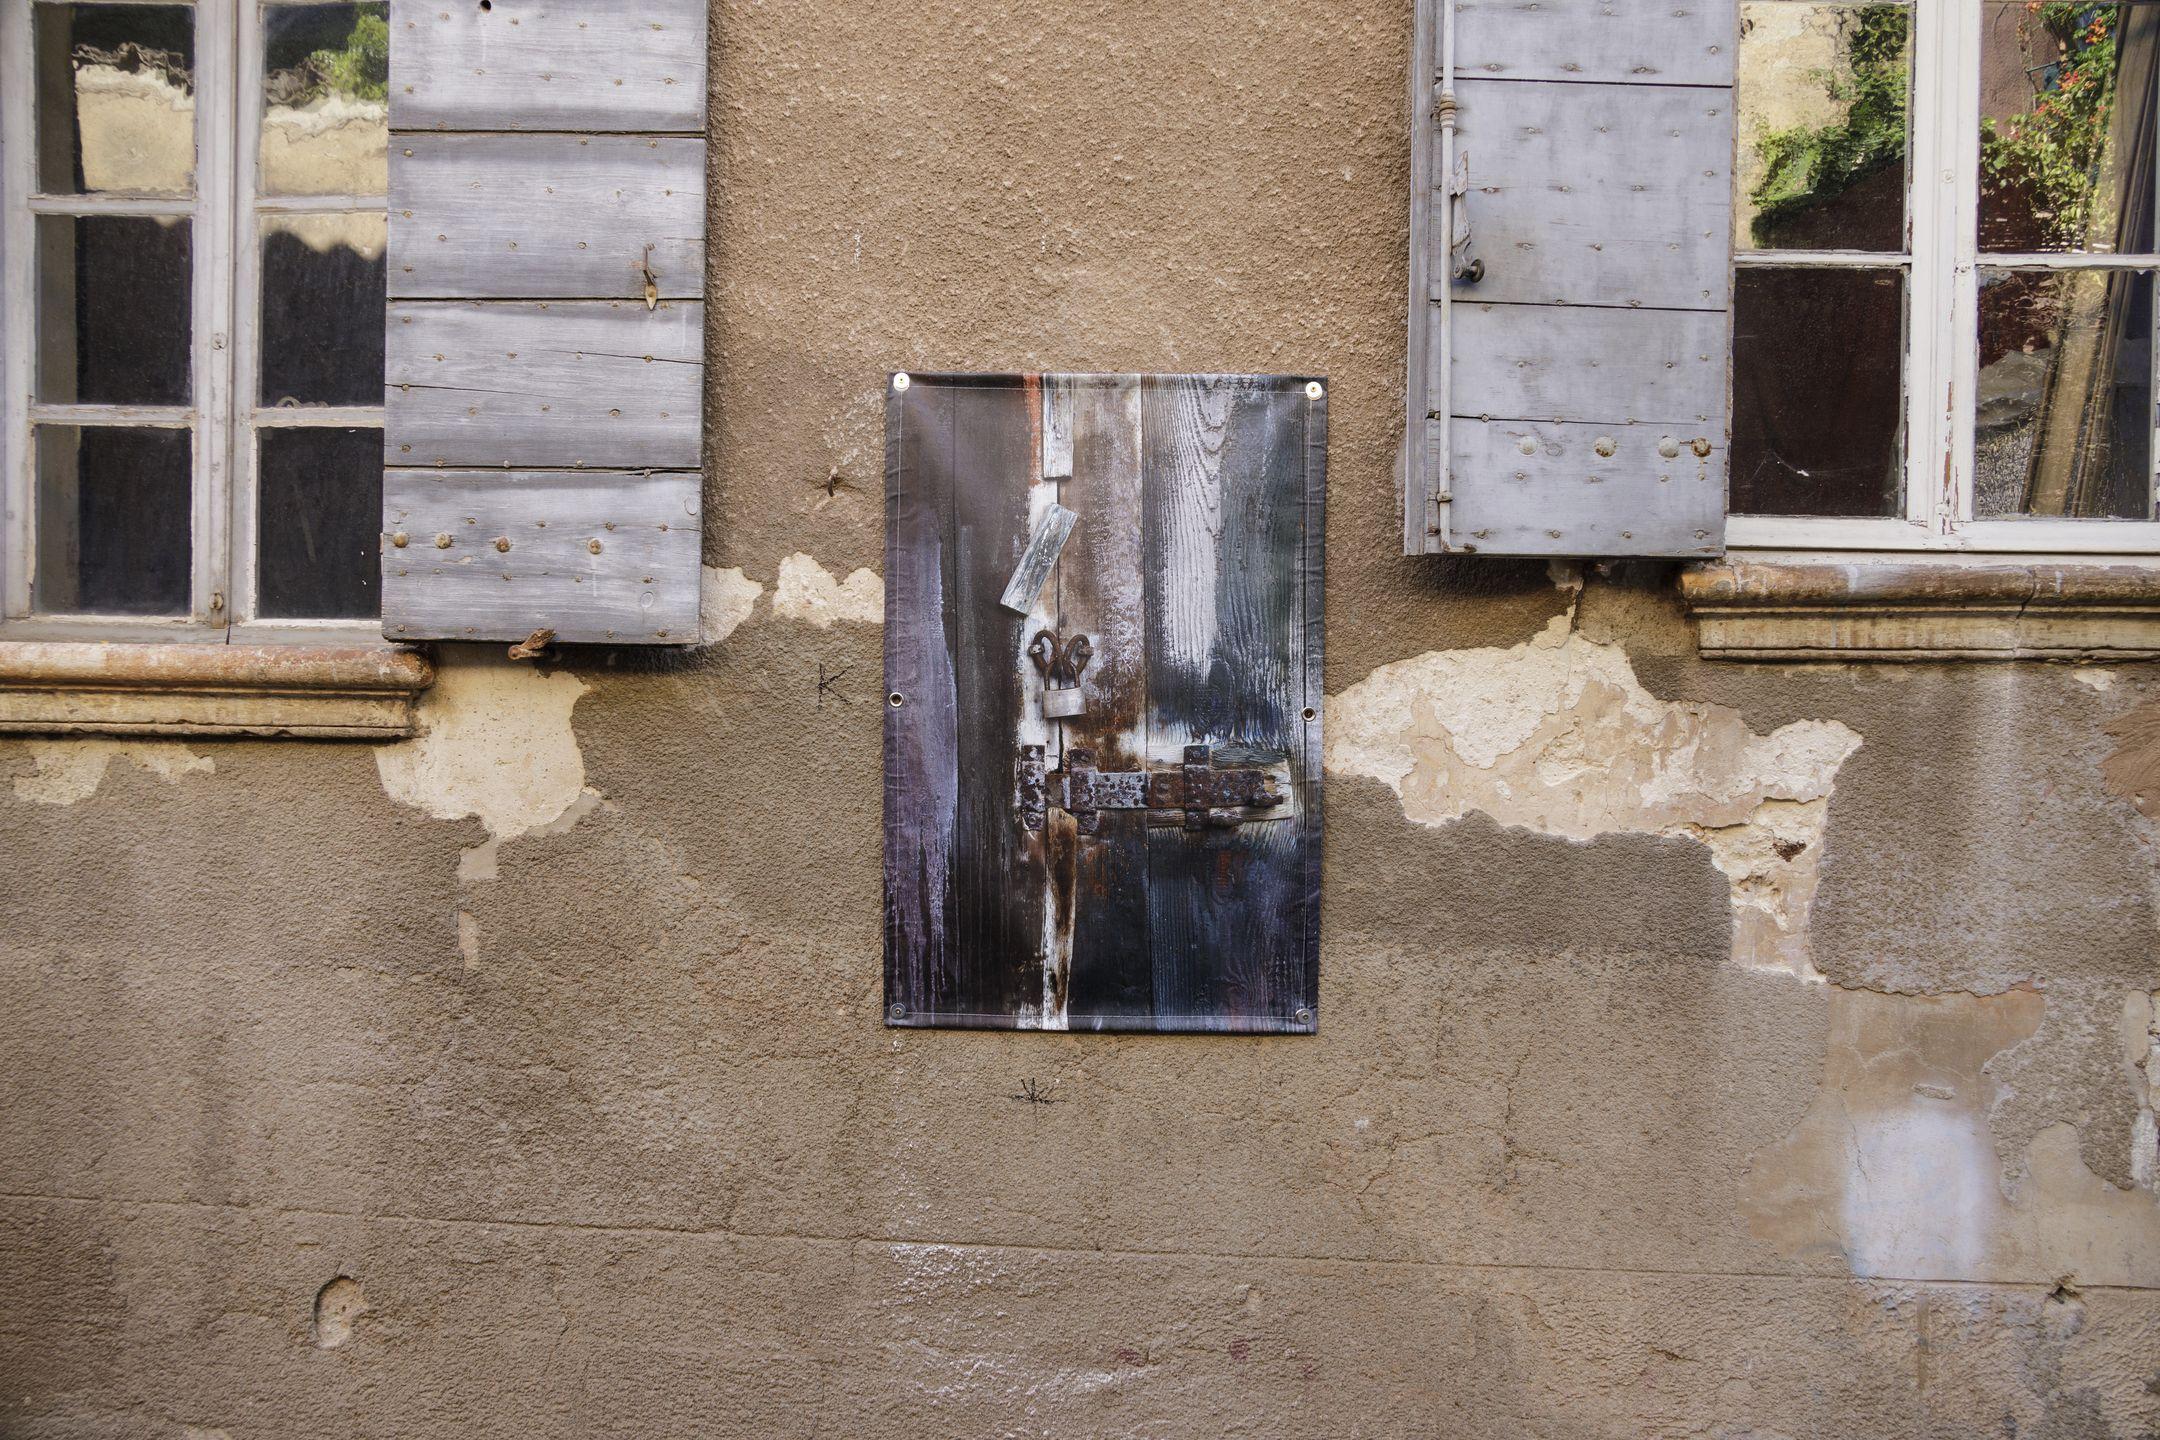 20210629-Provence-09-54-13-028